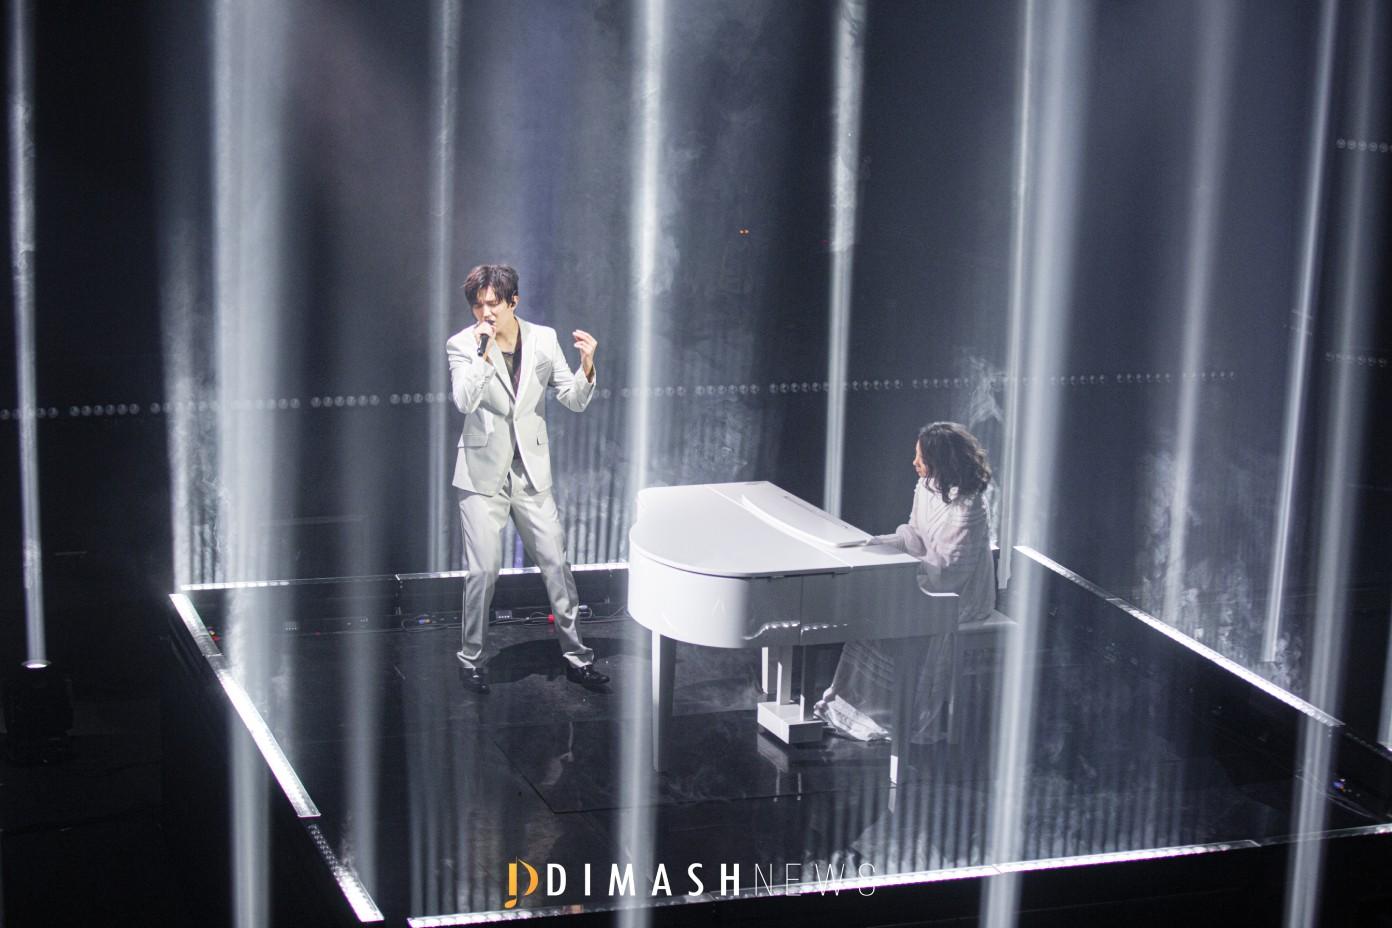 """DIMASH DIGITAL SHOW"": How Dimash's First Online Concert was Prepared"